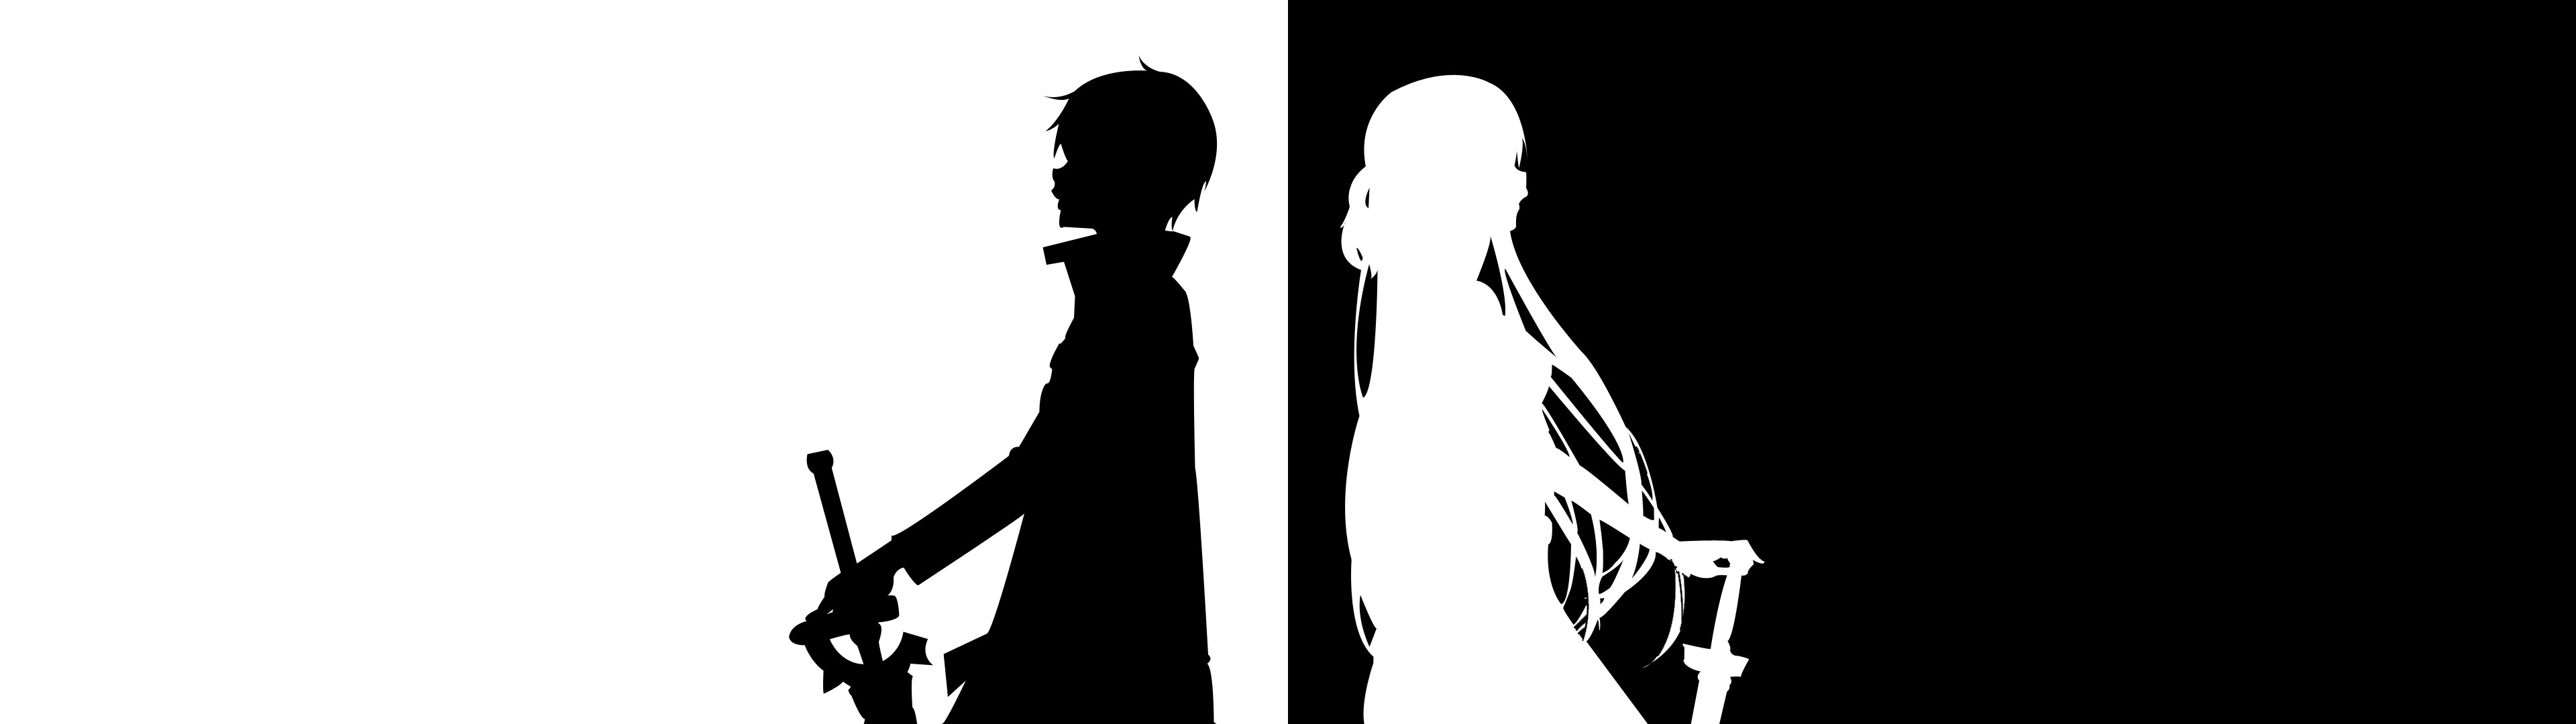 Minimal Sword Art Online [Dual-Screen] [3840×1080] …